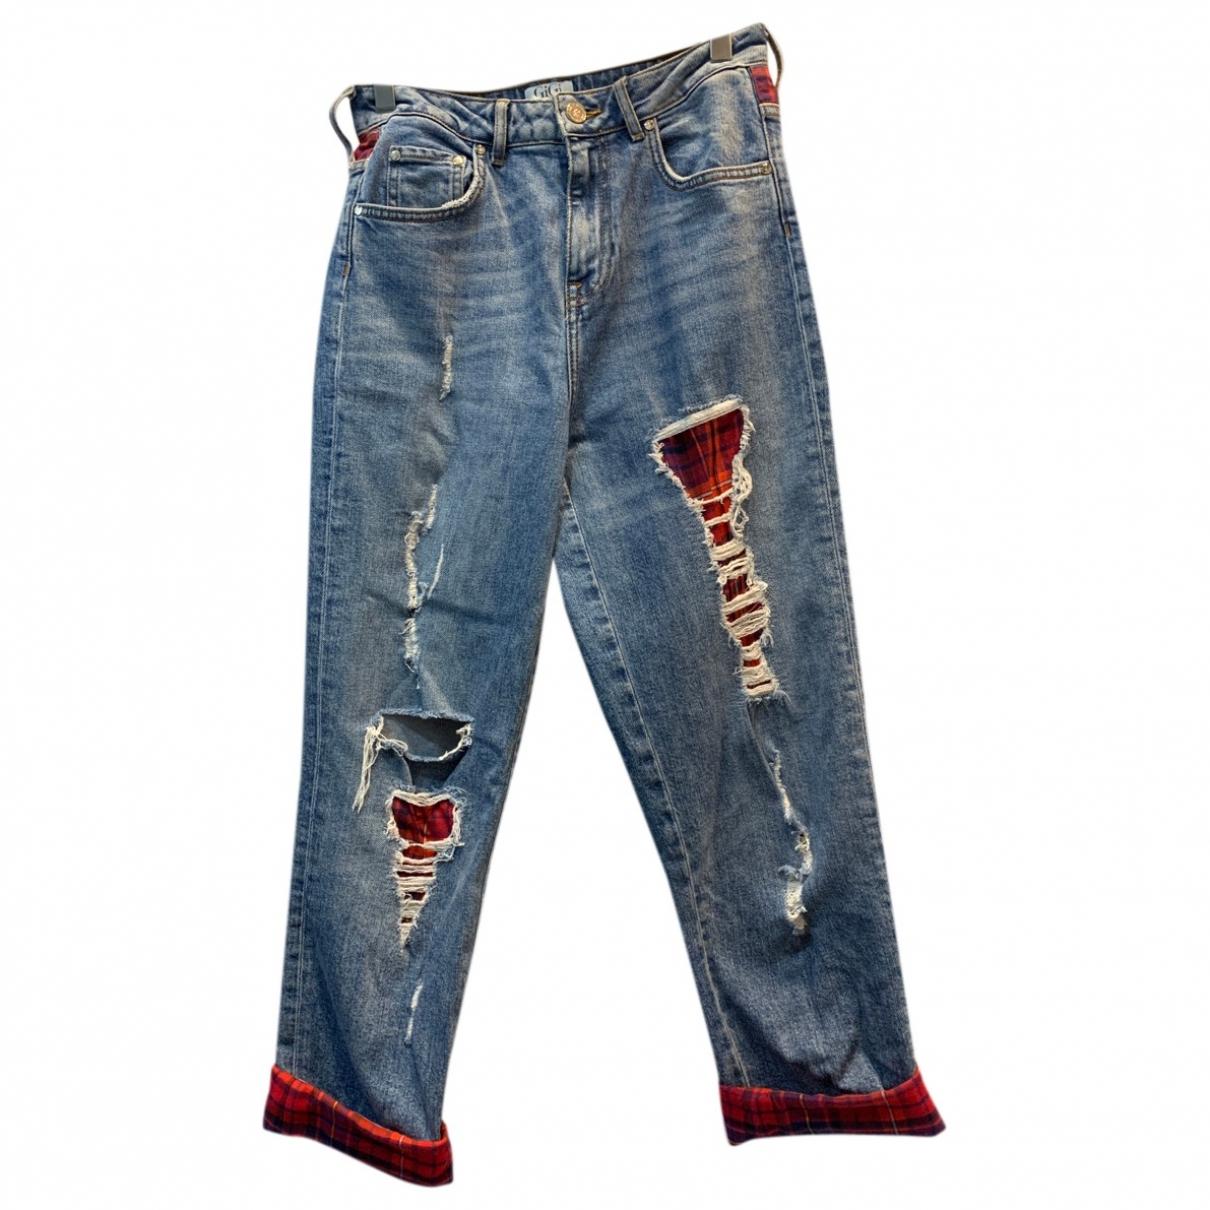 Gigi Hadid X Tommy Hilfiger \N Blue Denim - Jeans Jeans for Women 28 US